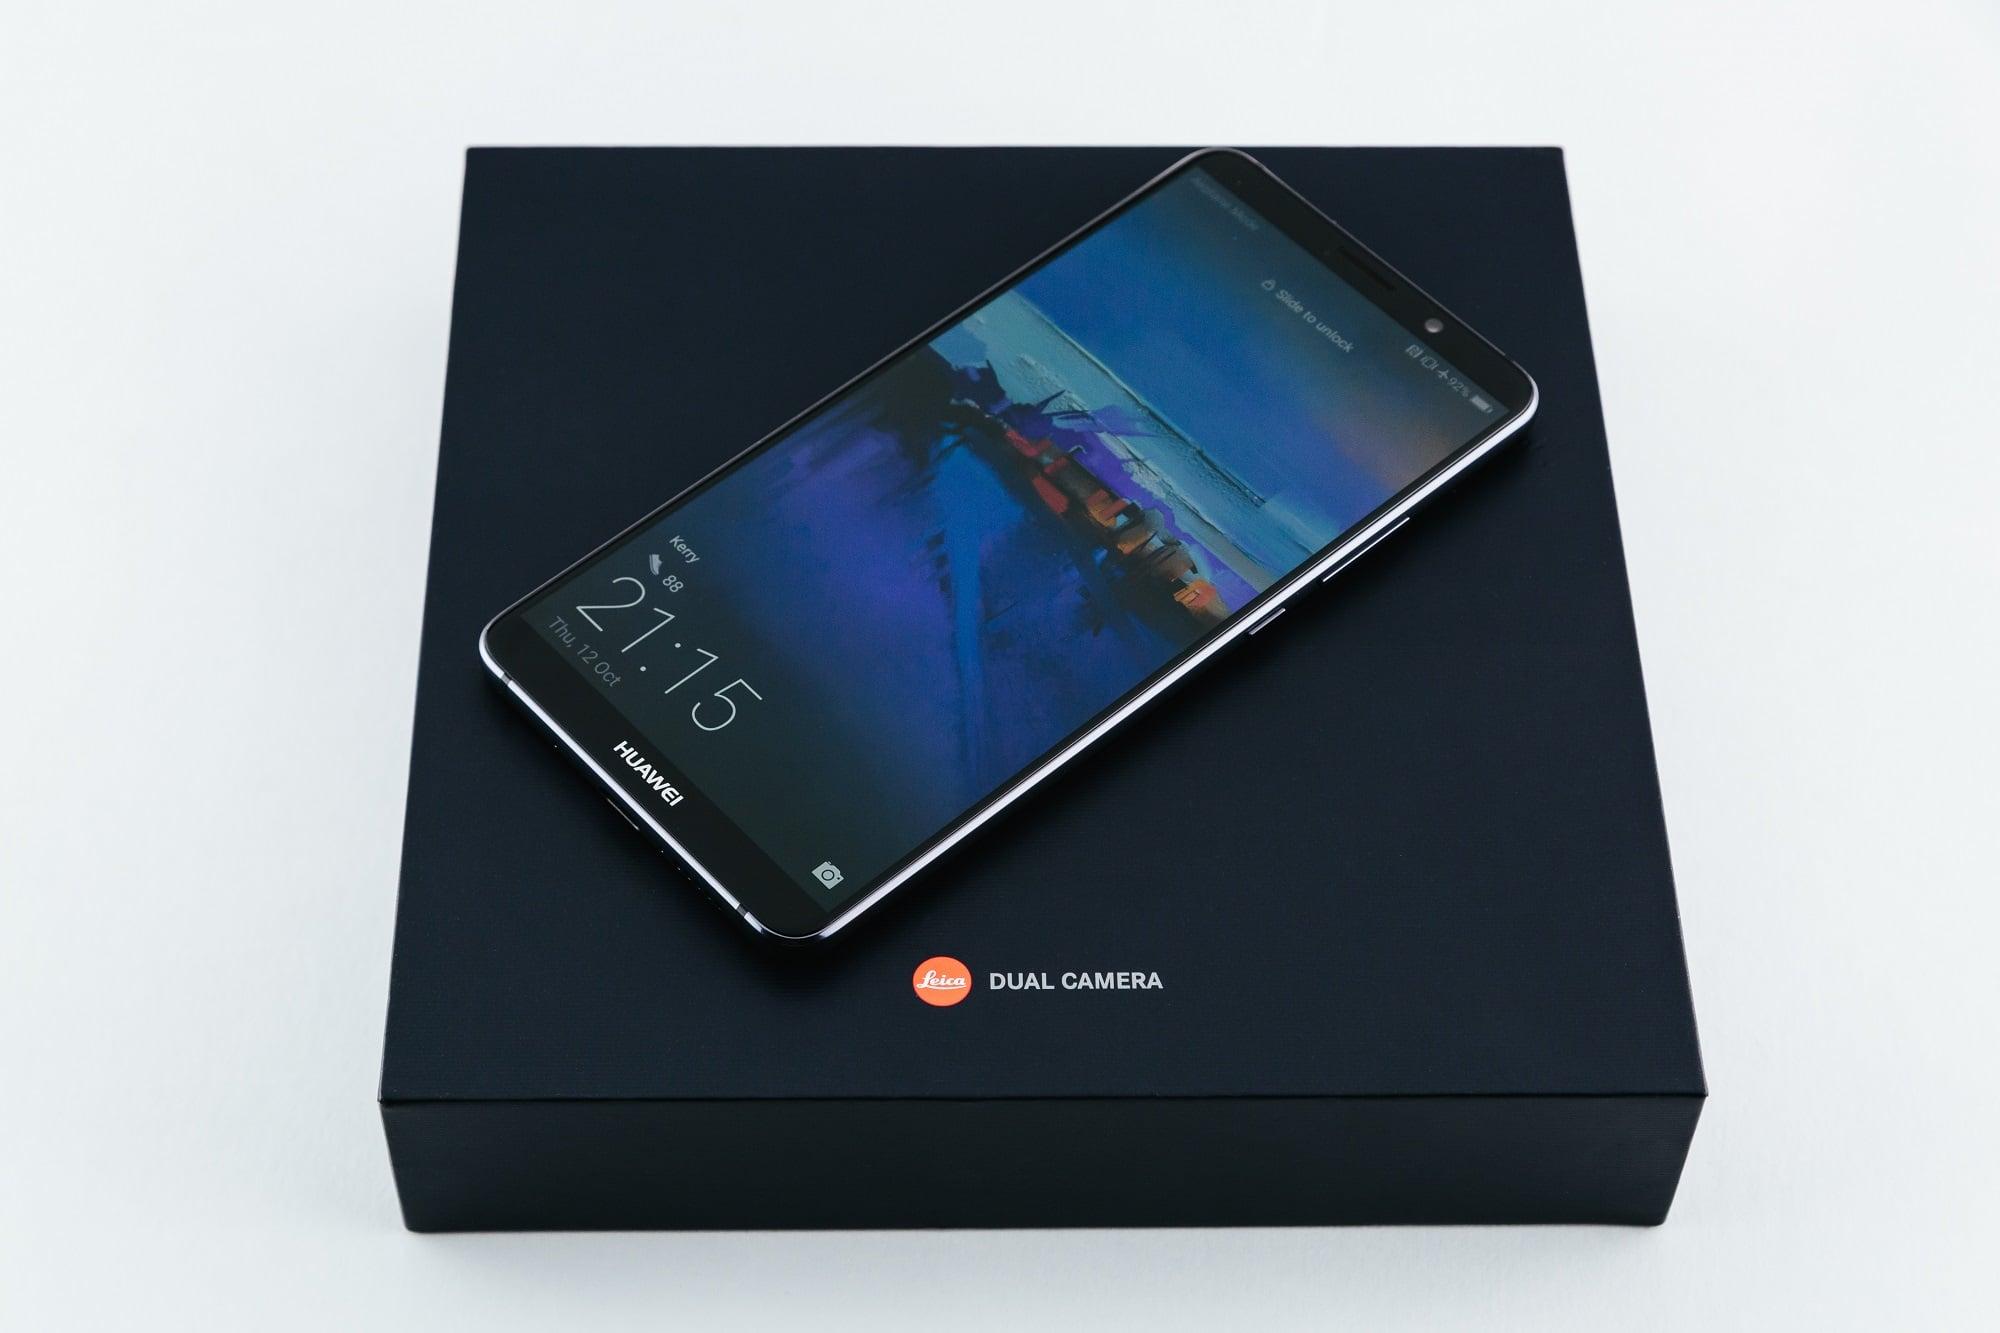 Huawei Mate 10 Pro Vs Huawei Mate 9 Por 243 Wnanie Parametr 243 W